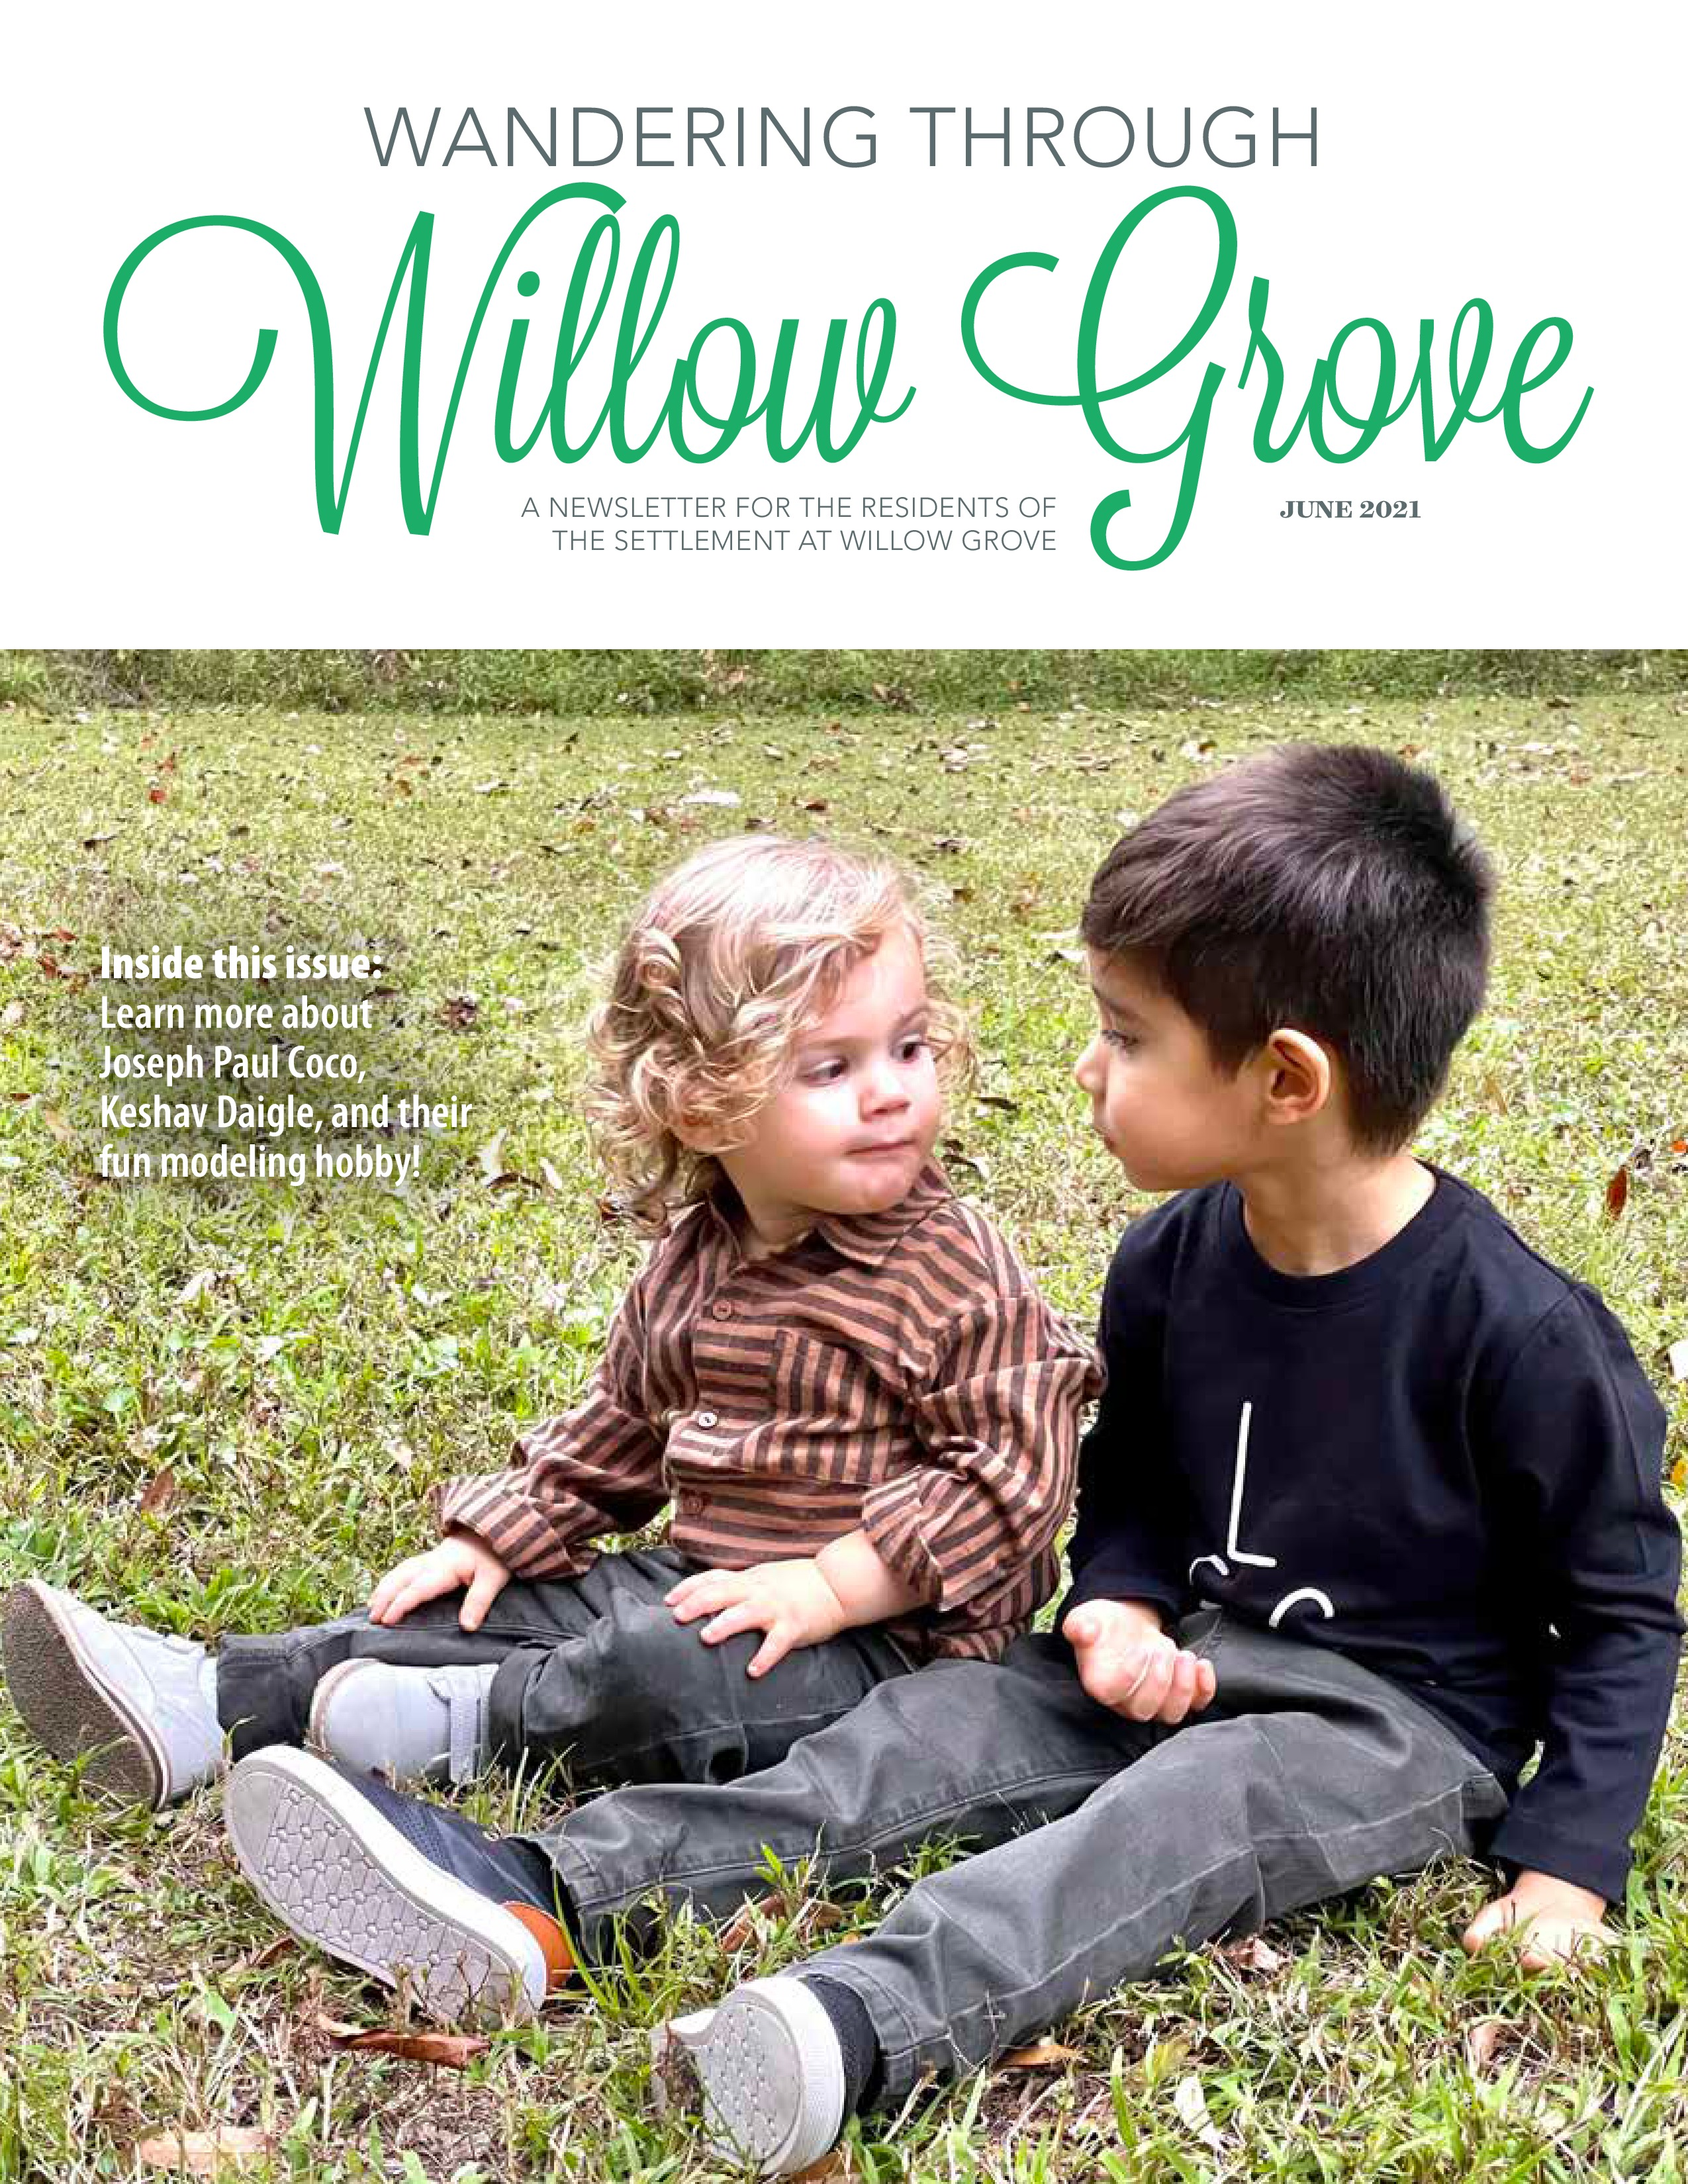 Wandering Through Willow Grove 2021-06-01